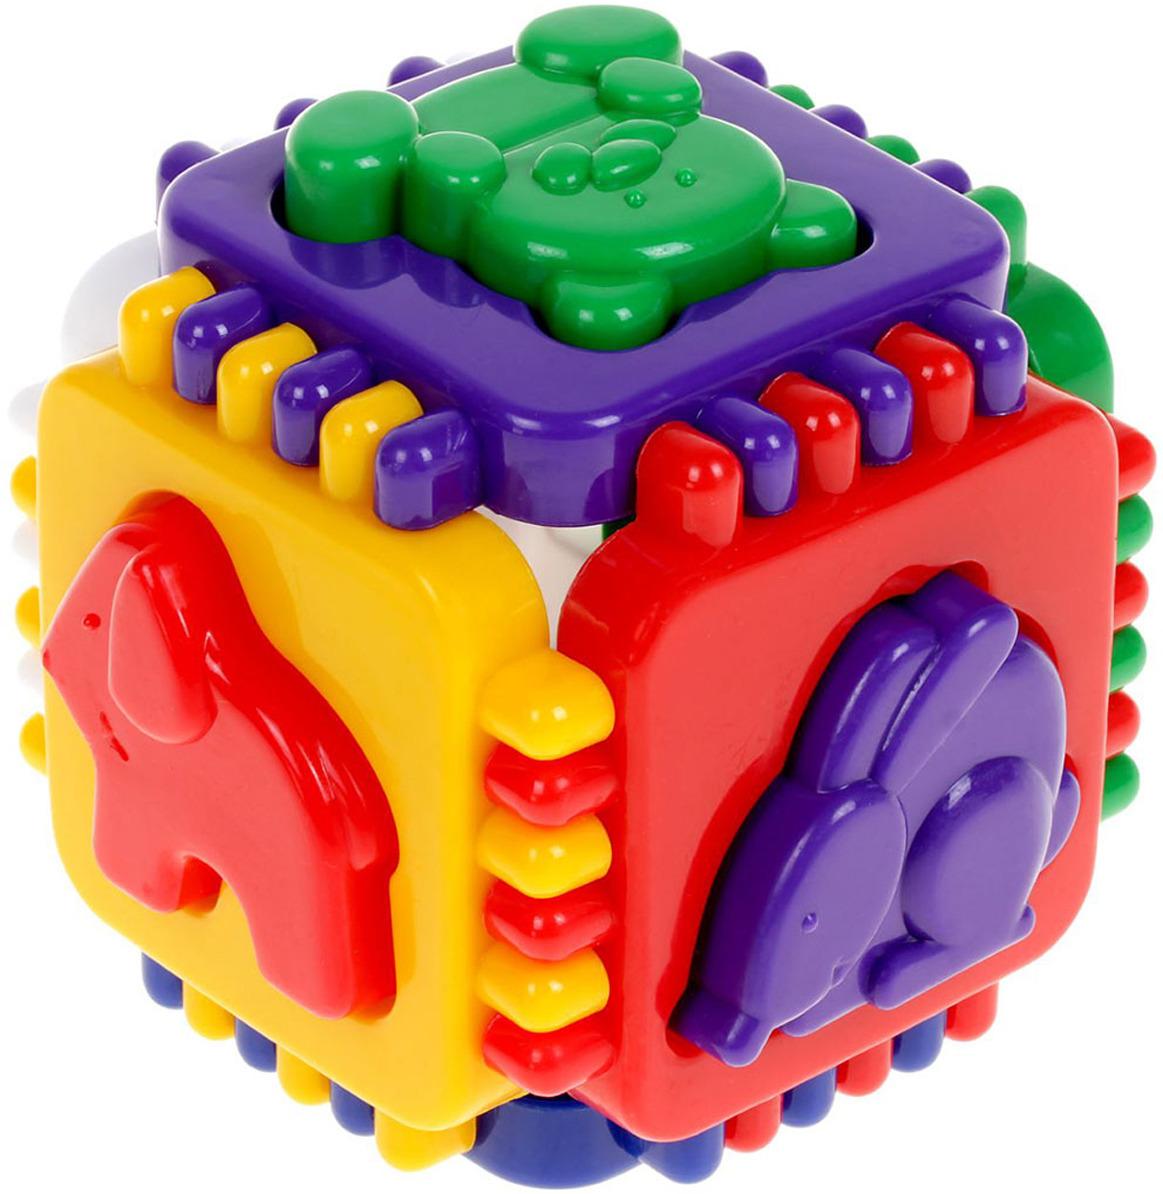 Сортер MaxGroup Кубик логический, 2699752 stellar развивающая игра сортер логический кубик 01314